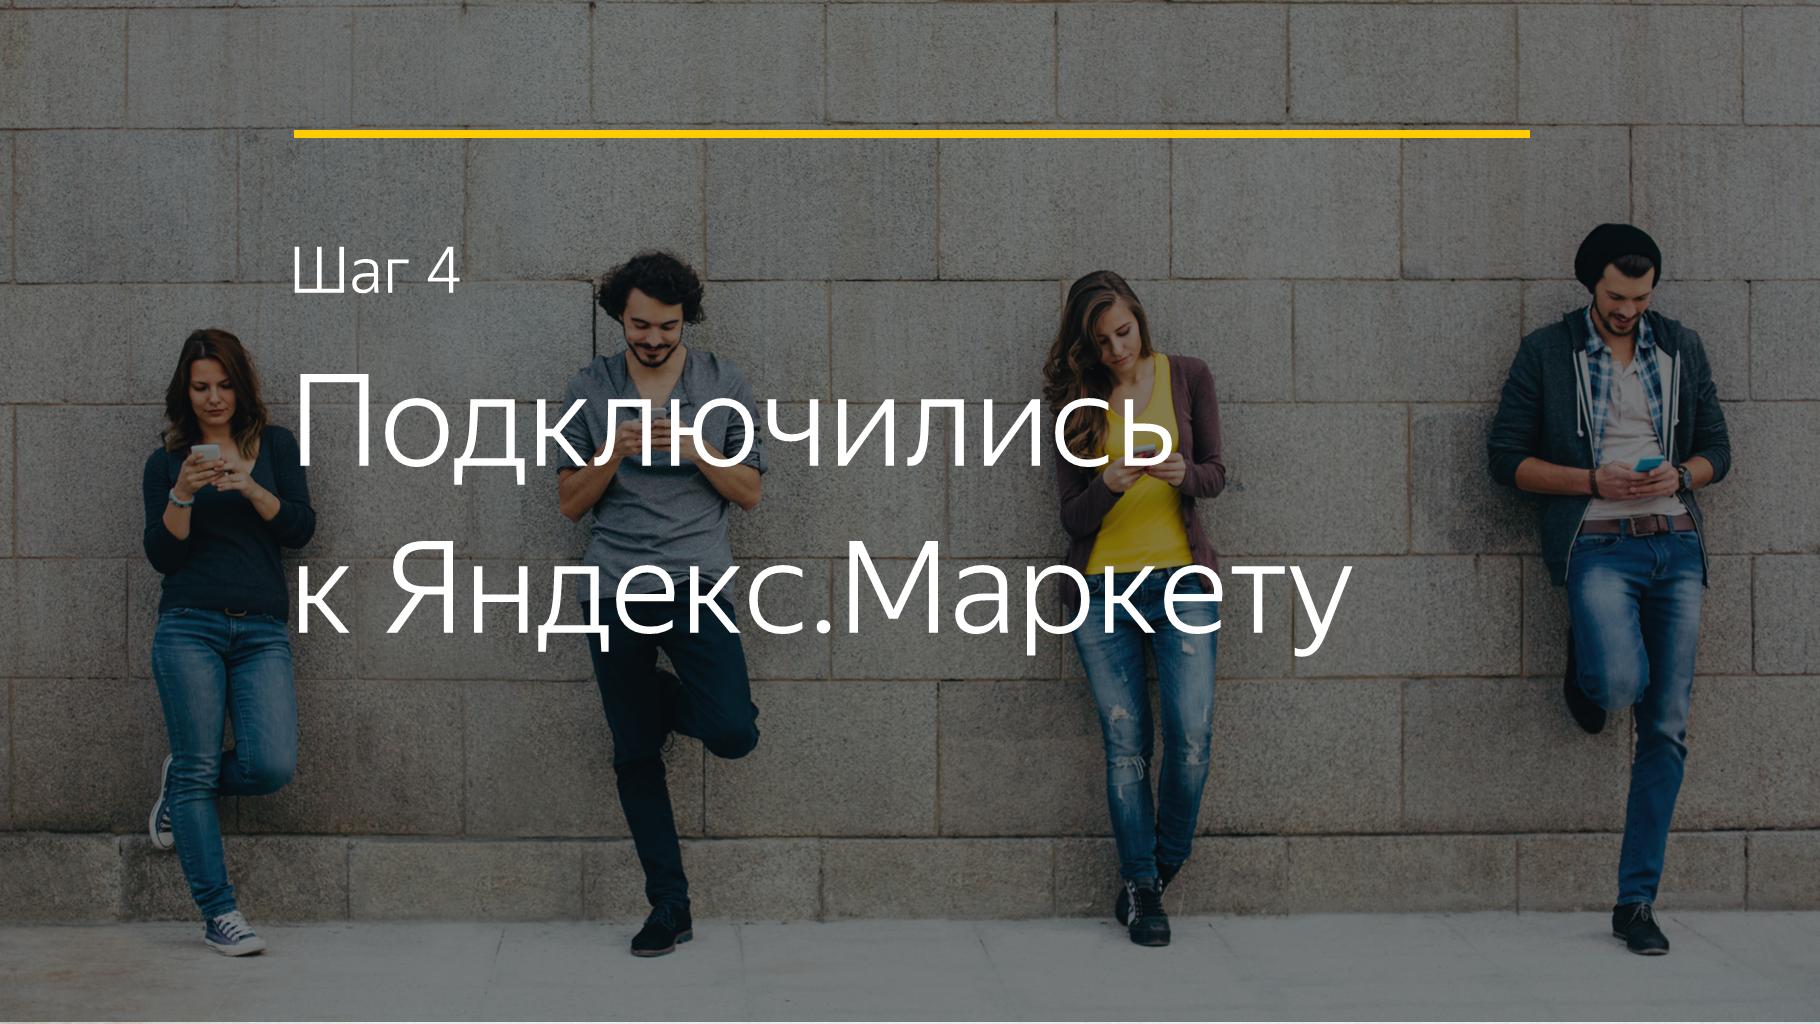 Шаг 4 Подключились к Яндекс.Маркету